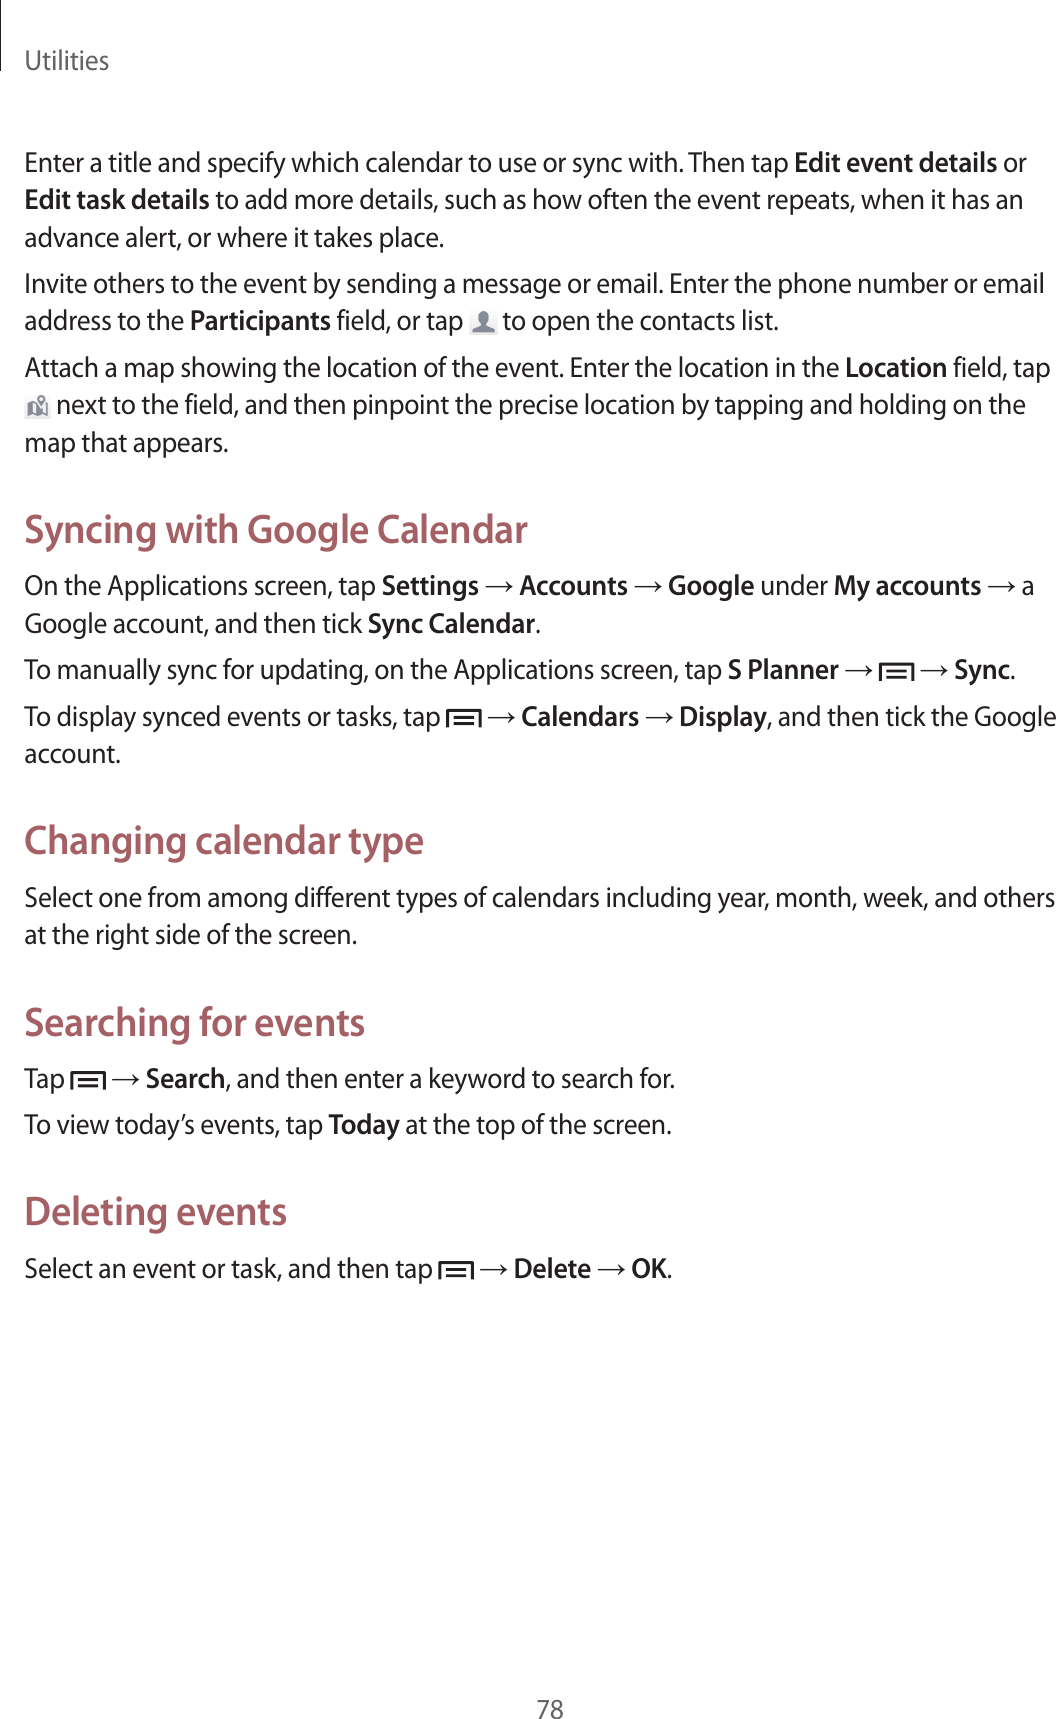 Samsung Galaxy S Duos 2 Users Manual